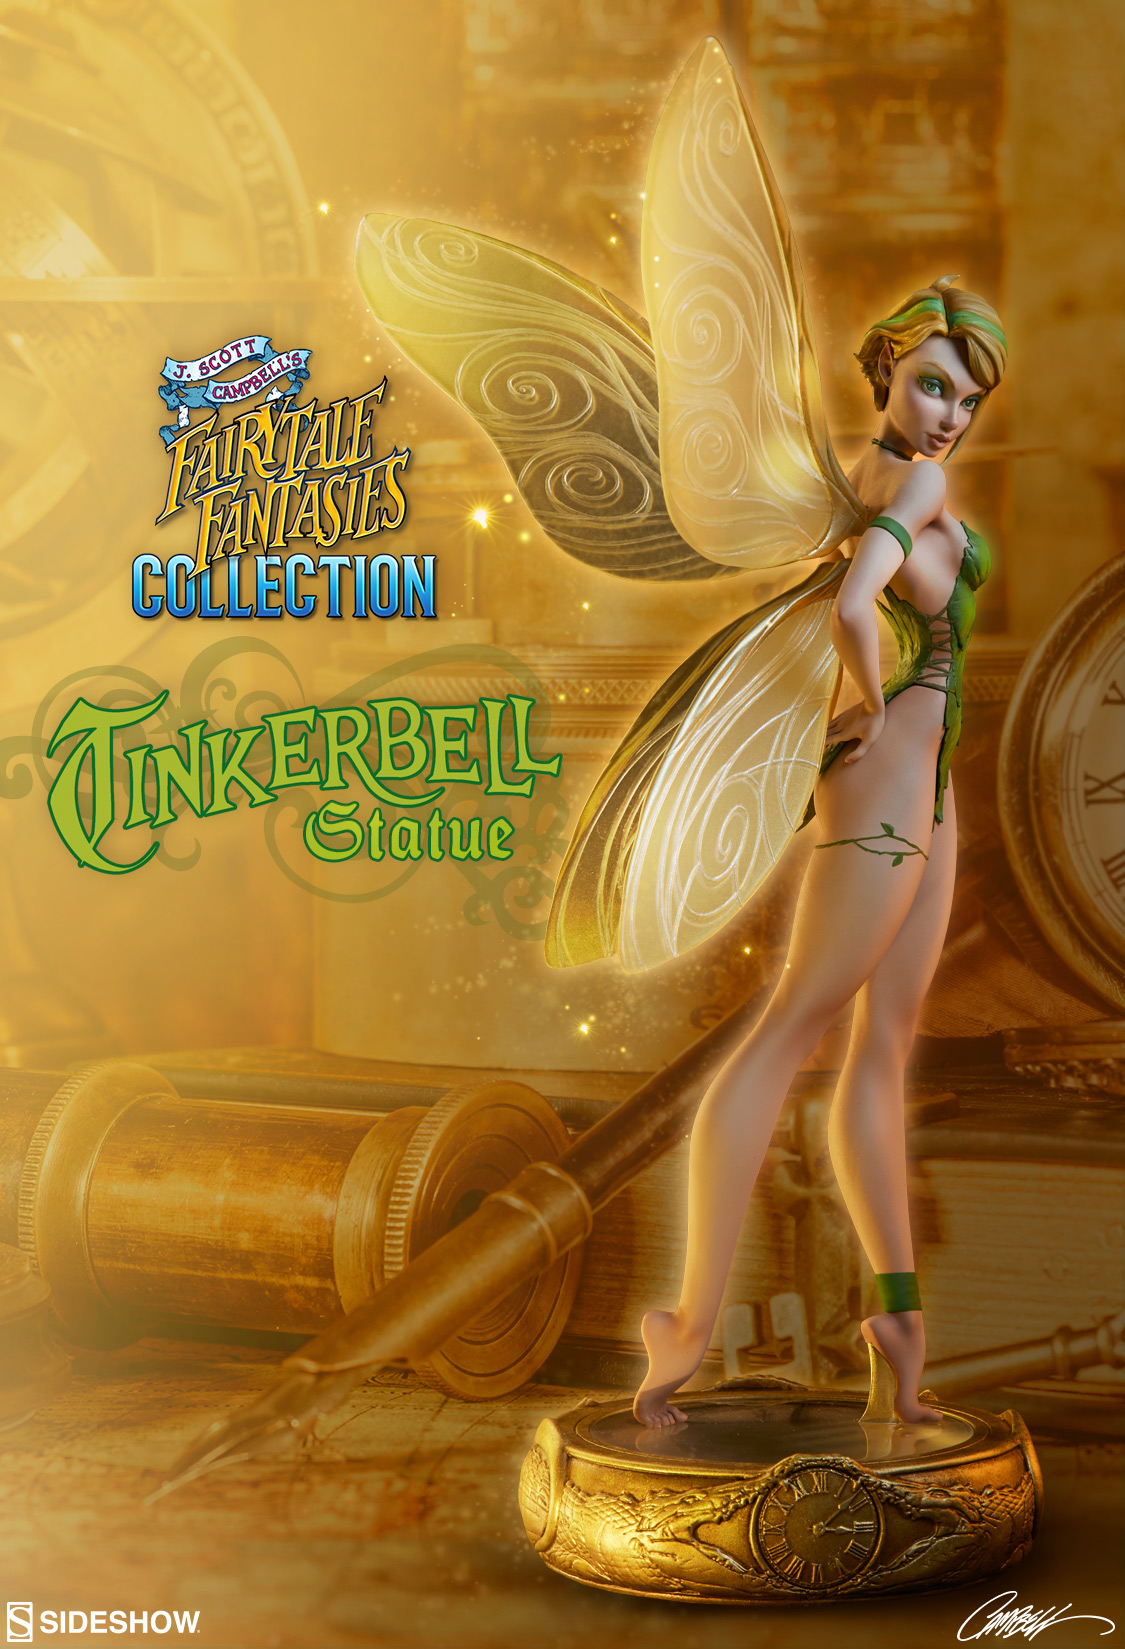 Tinkerbell Statue - J. Scott Campbell's Fairytale ...